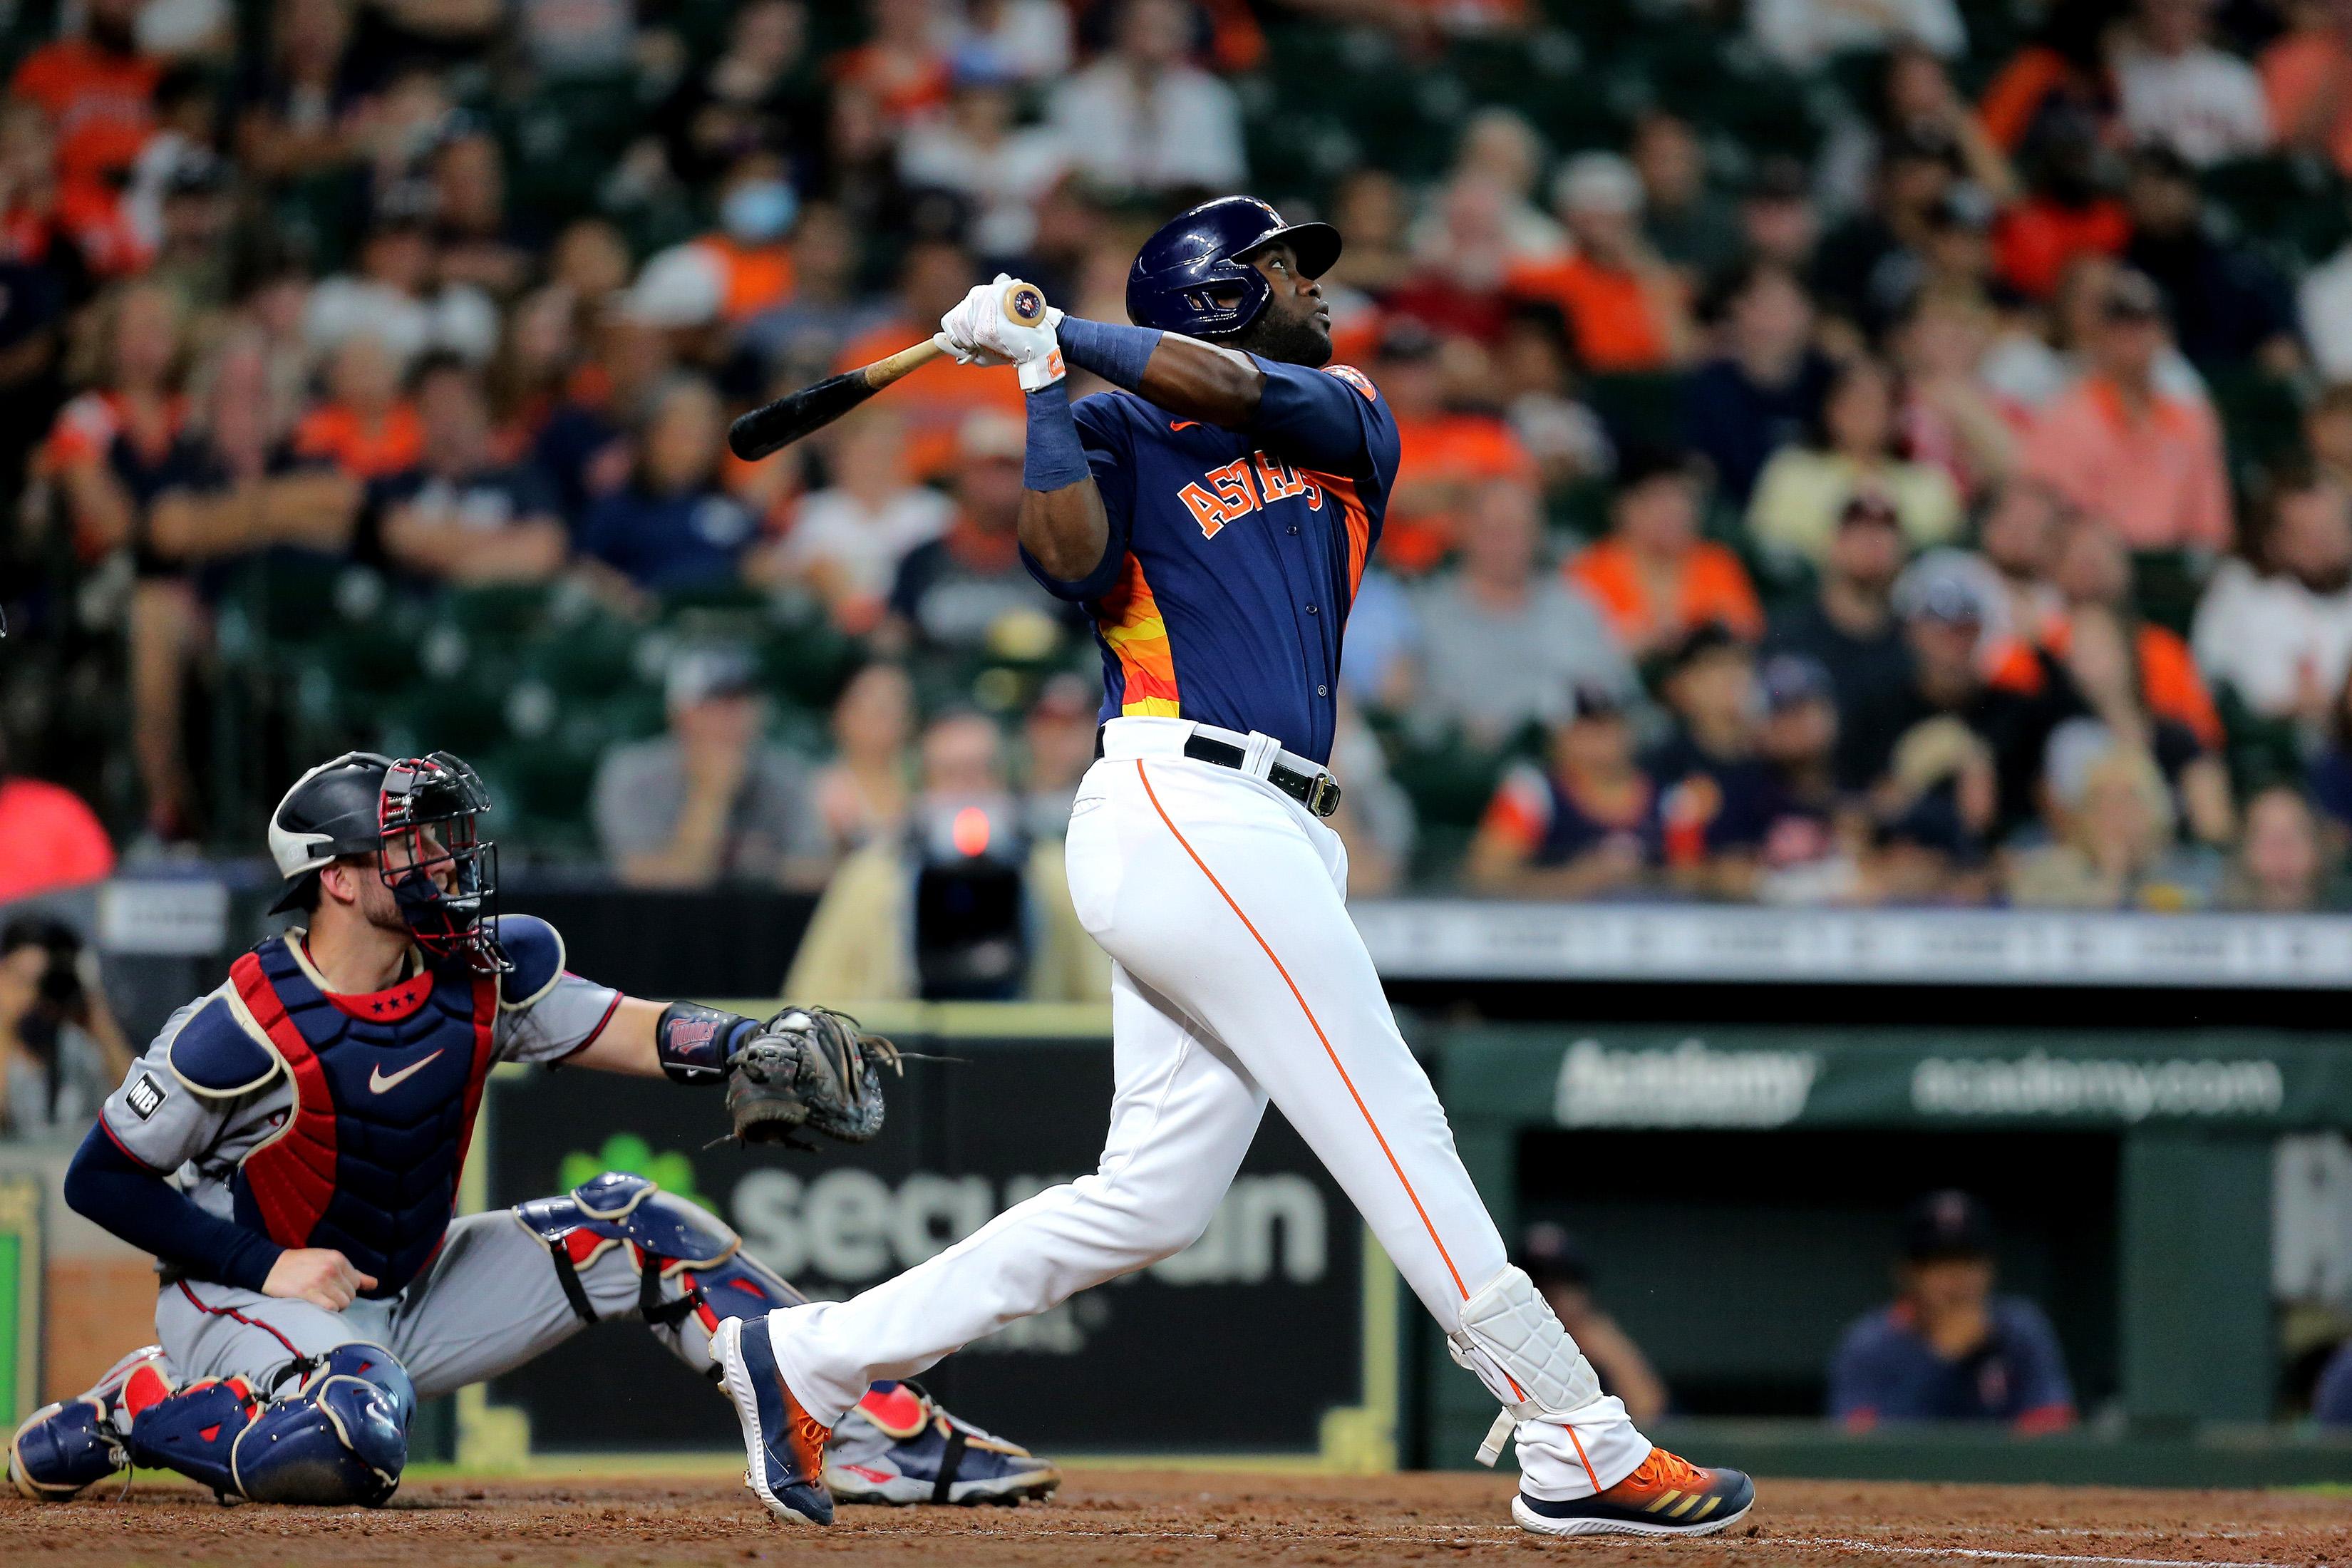 olorado Rockies vs Houston Astros Prediction, 8/11/2021 MLB Pick, Tips and Odds